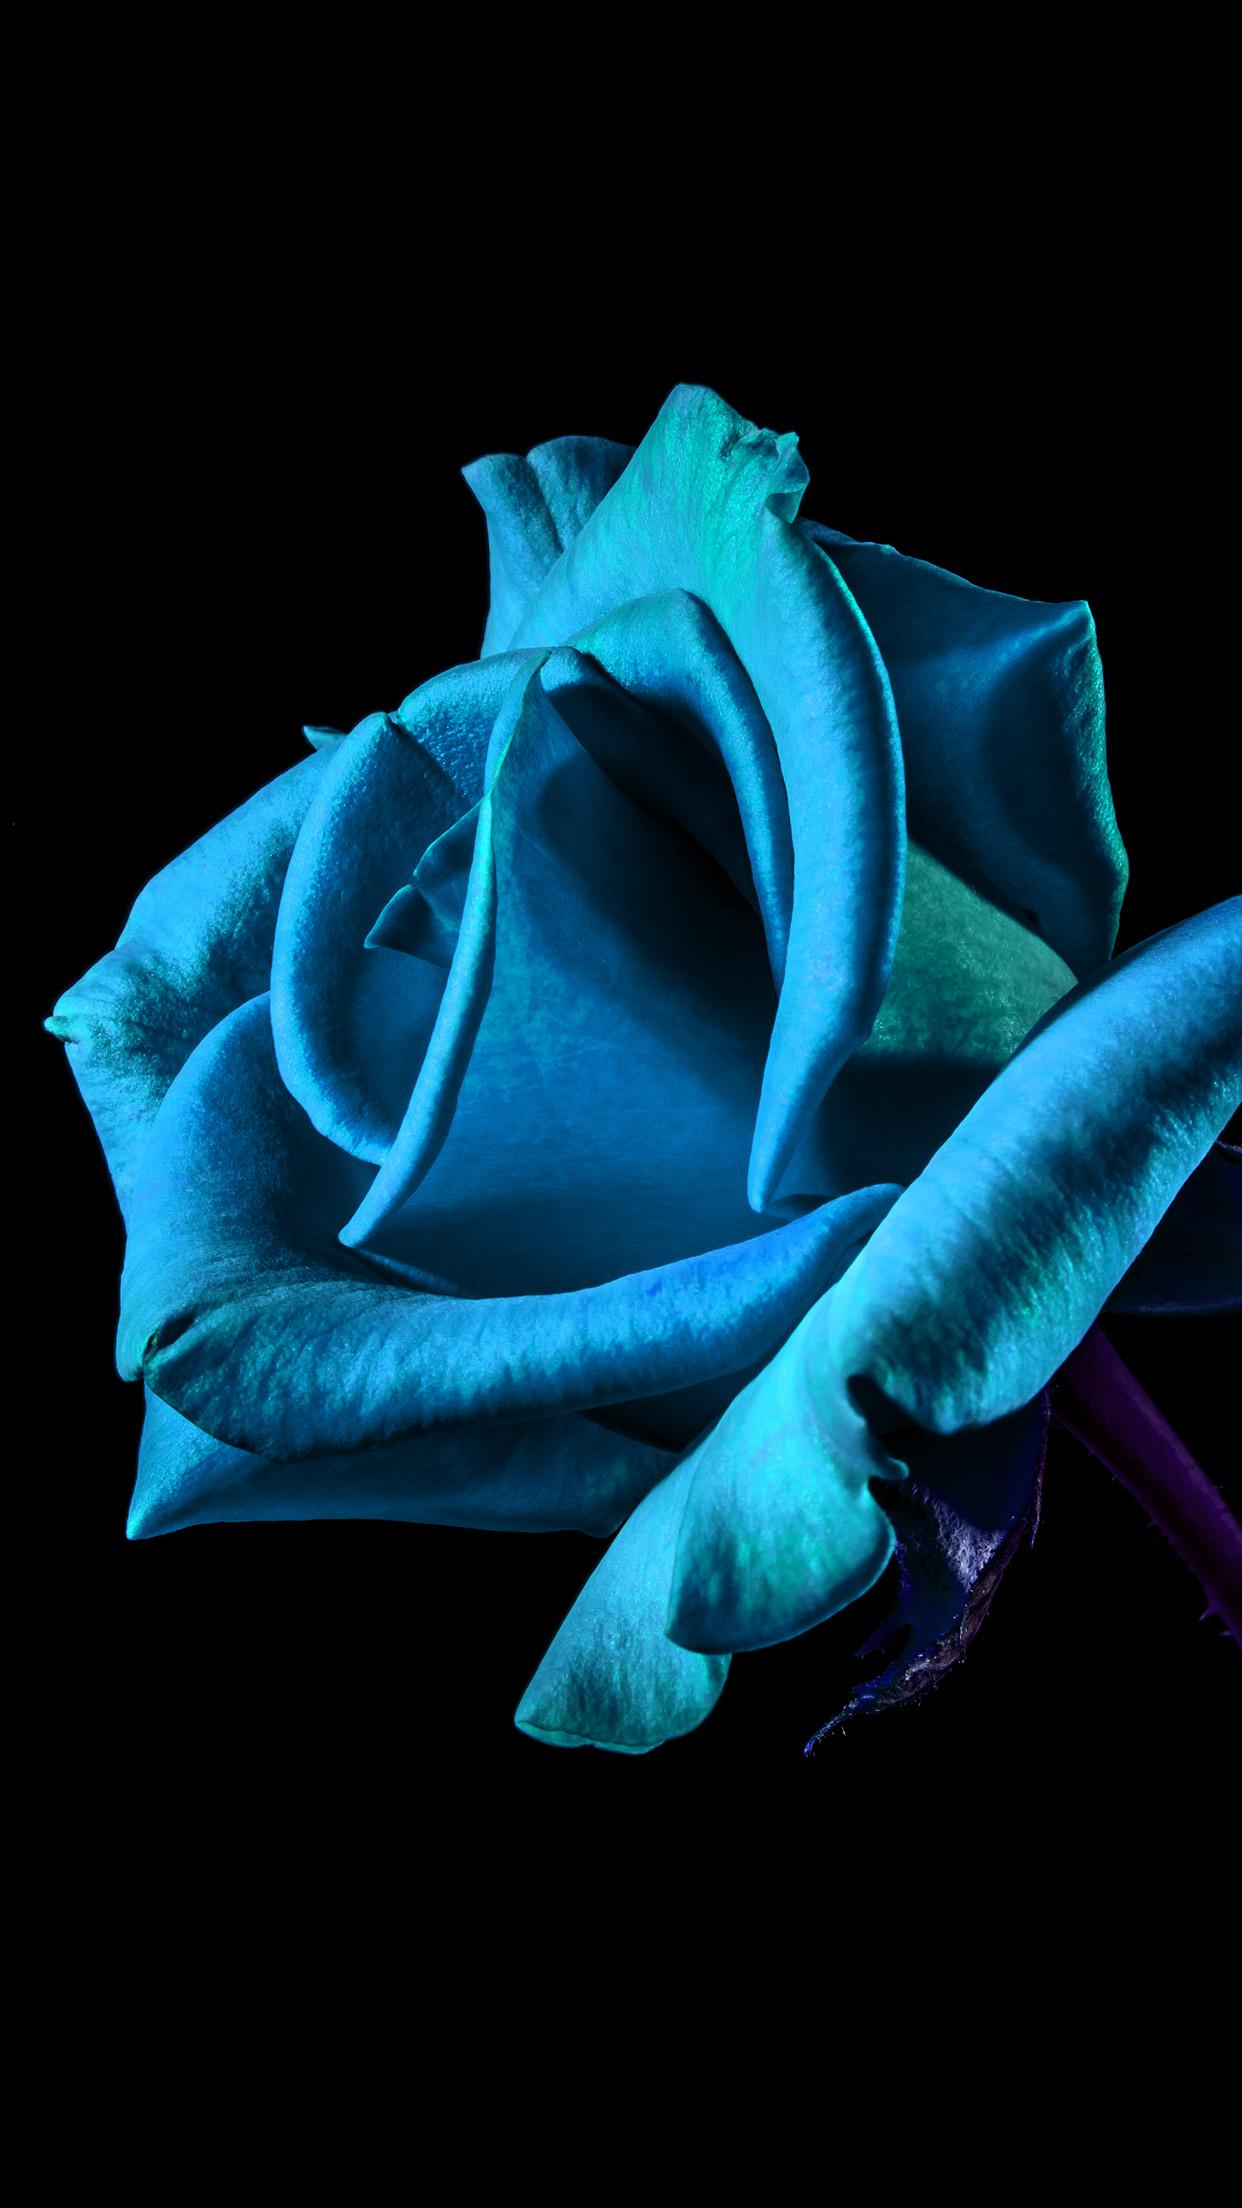 Flower dark background Rose blue 3Wallpapers iPhone Parallax 3Wallpapers : notre sélection de fonds d'écran du 03/12/2016